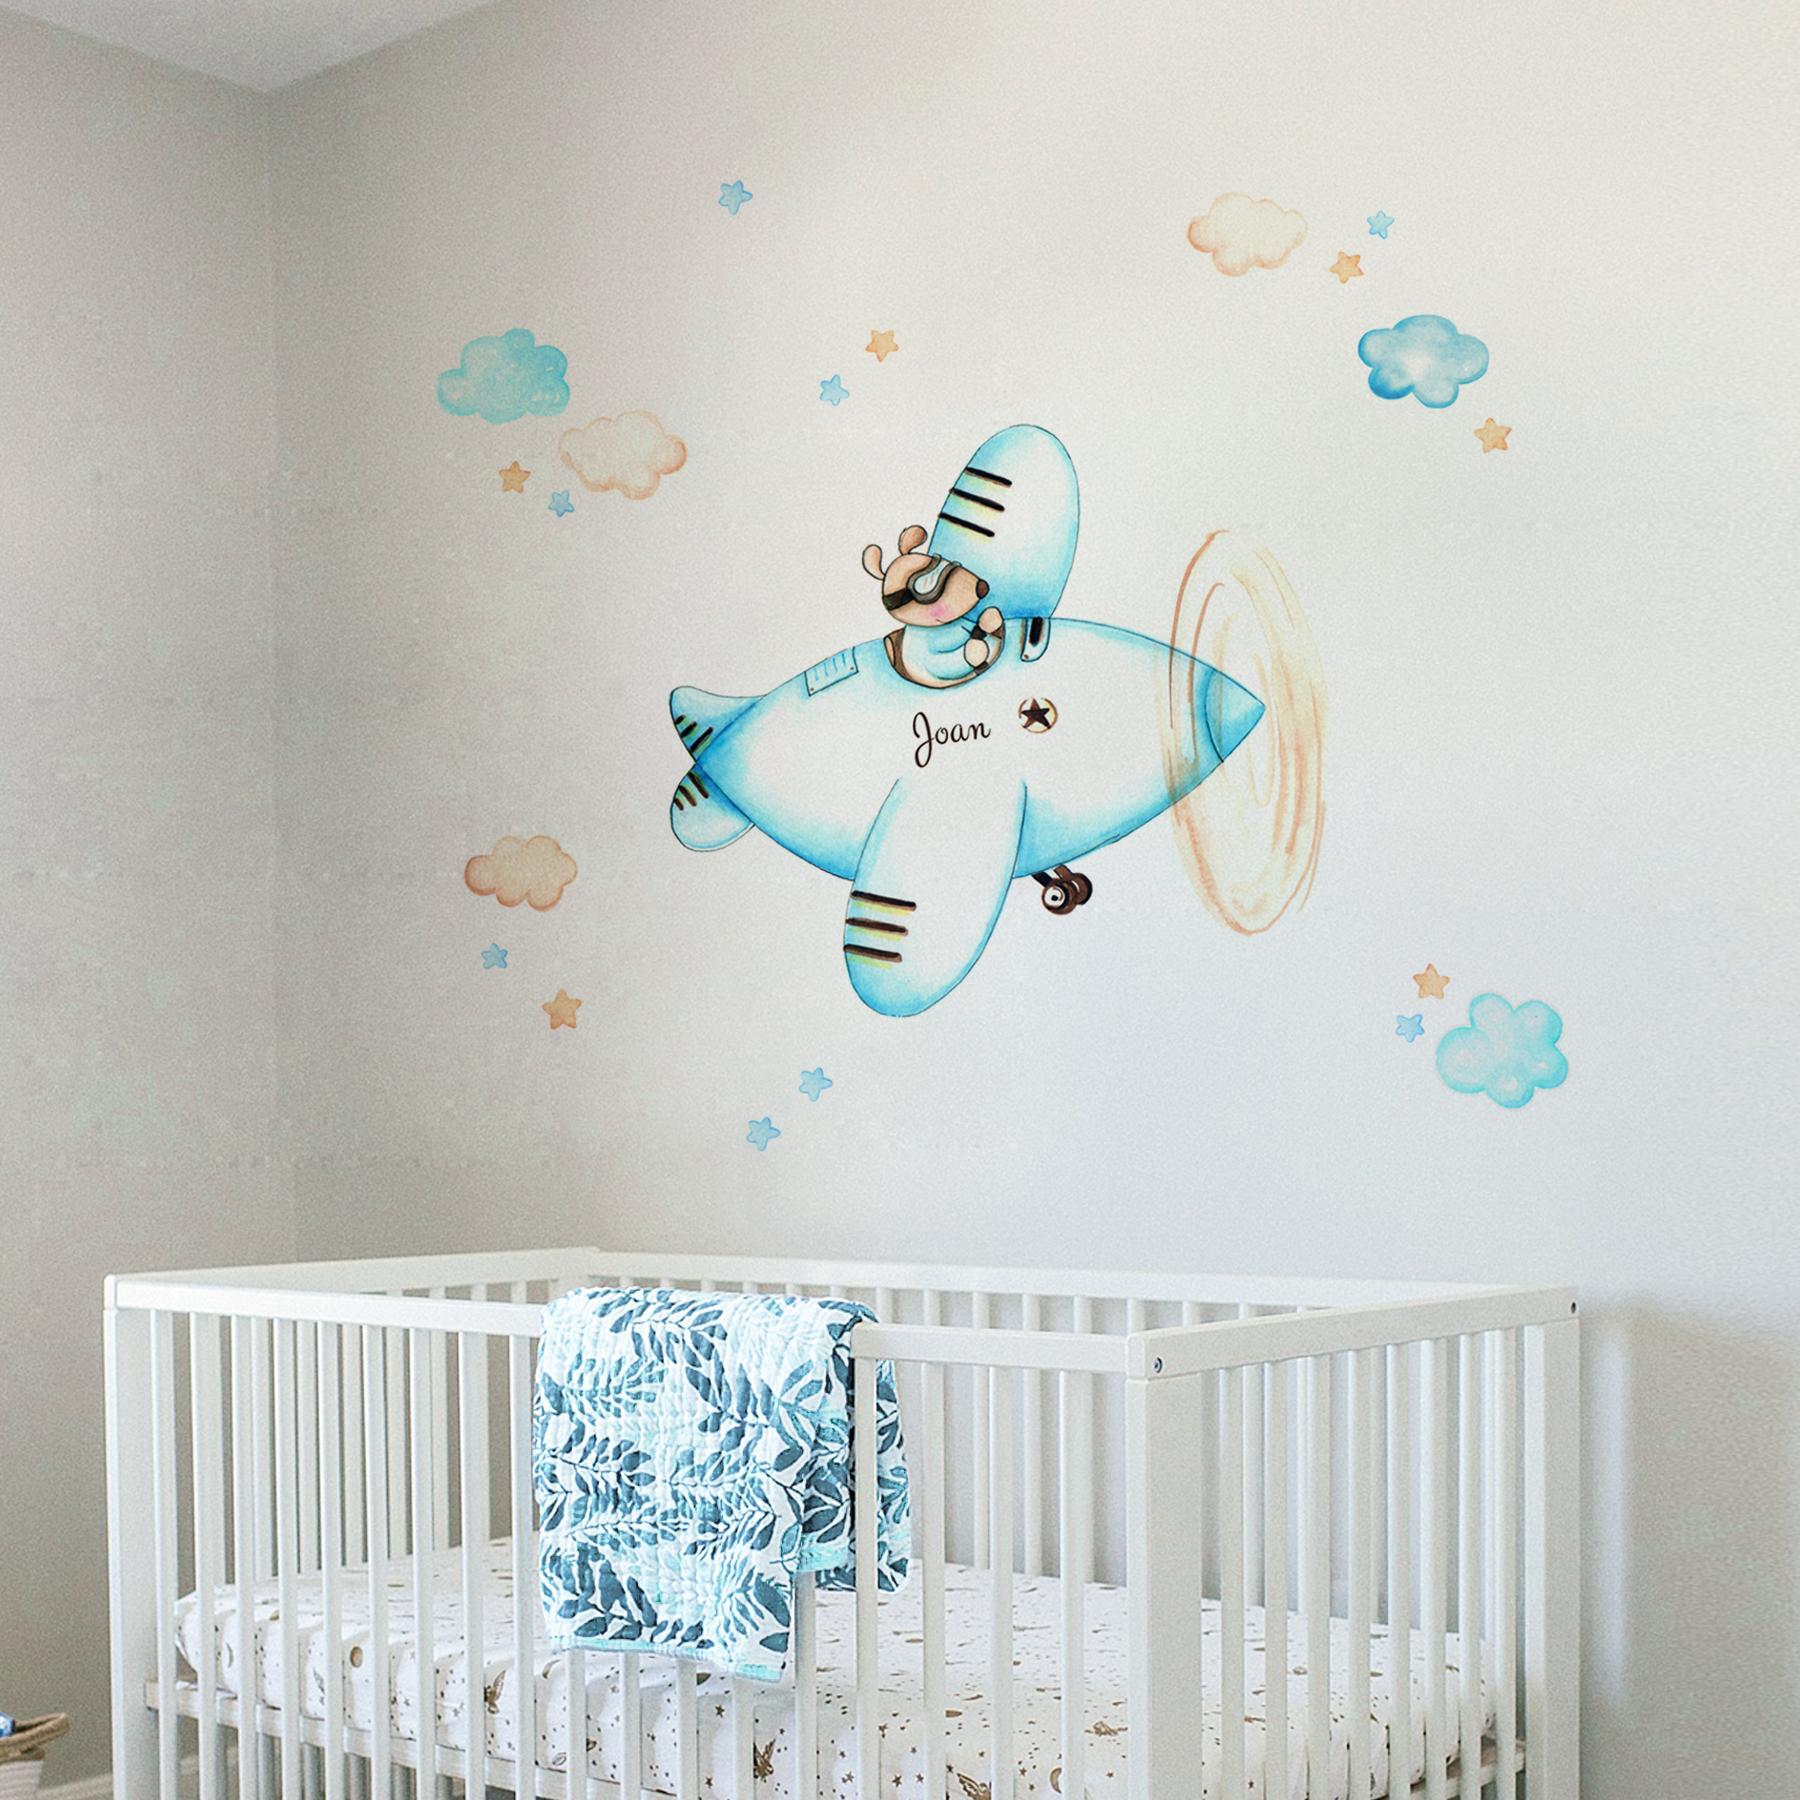 VINILO INFANTIL: Ratoncito con avión azul